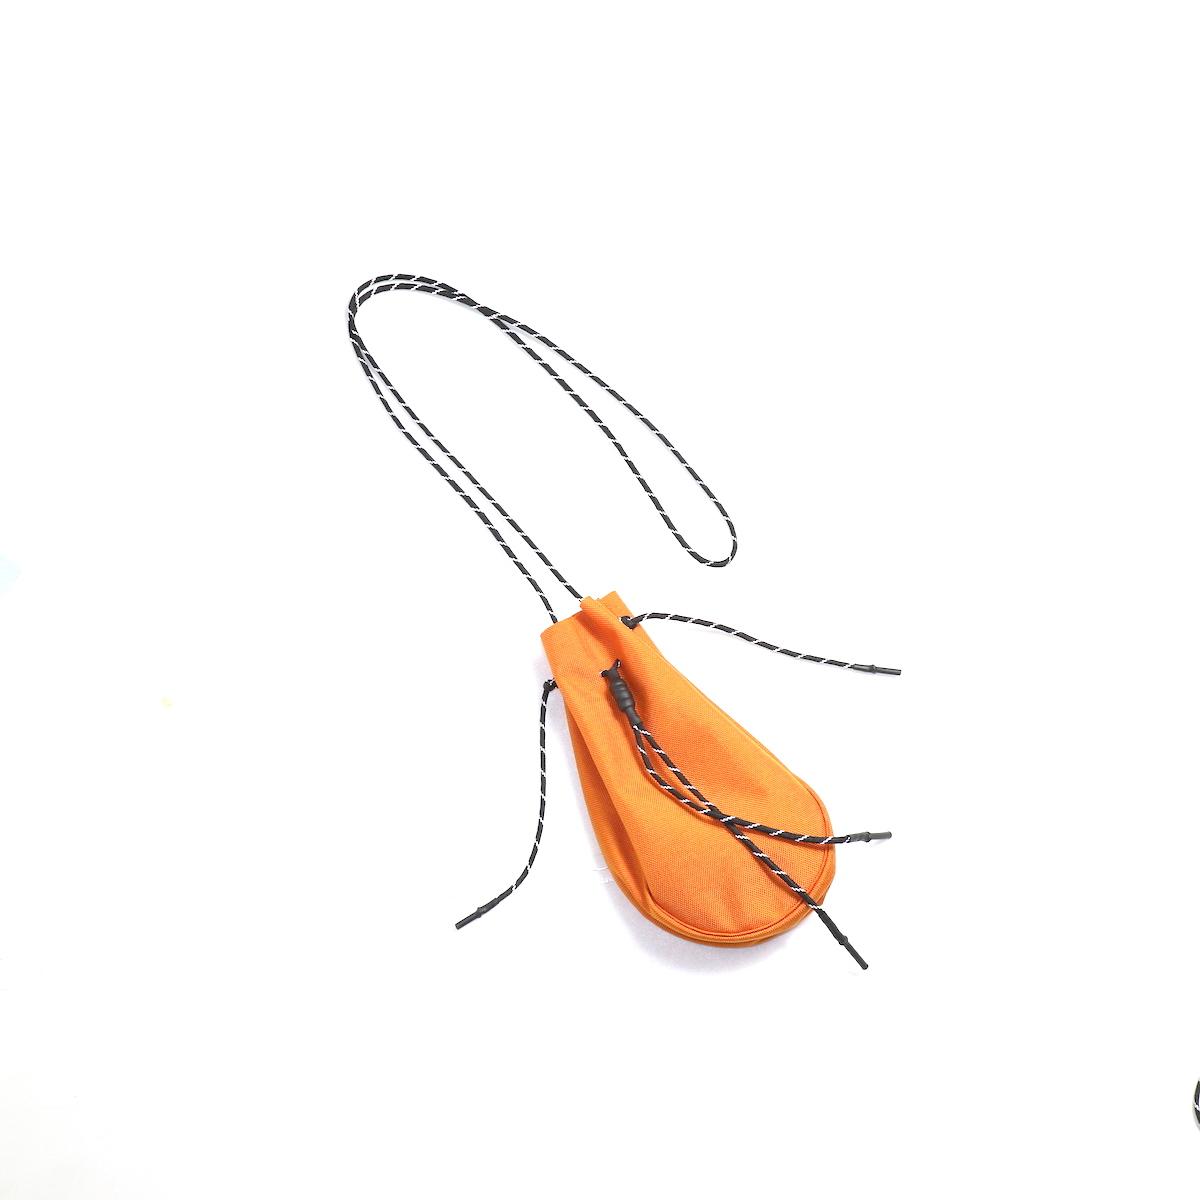 吉岡衣料店 / drawstring bag -S-. (Orange)